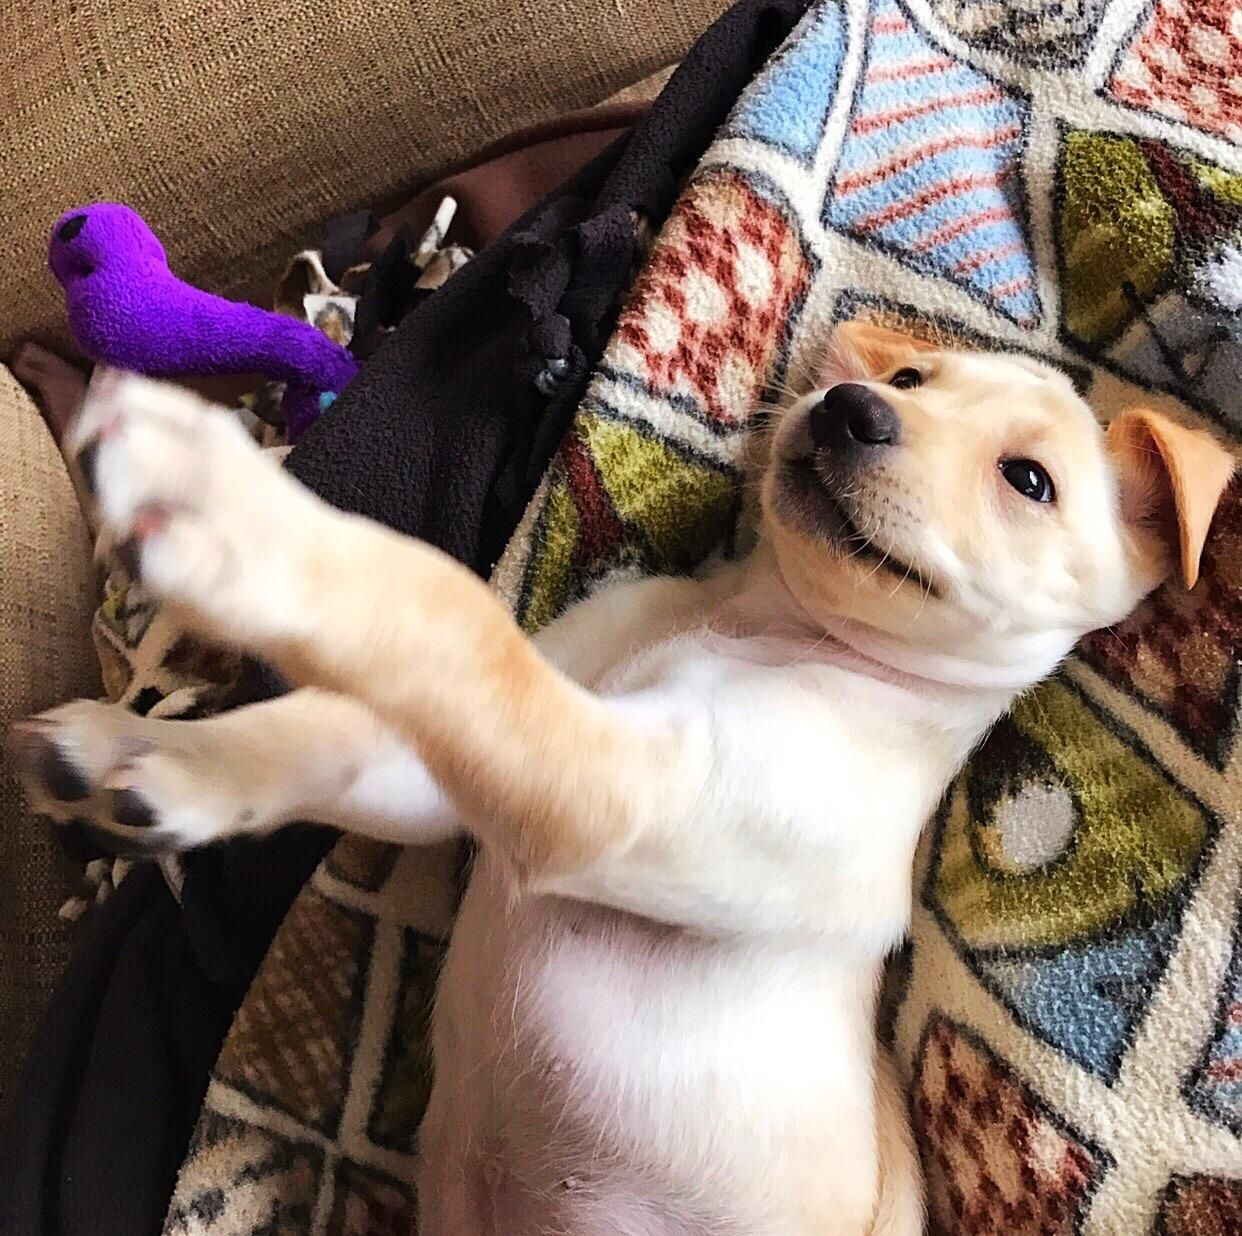 Playtime iftqwscku cute pinterest dog eating dog